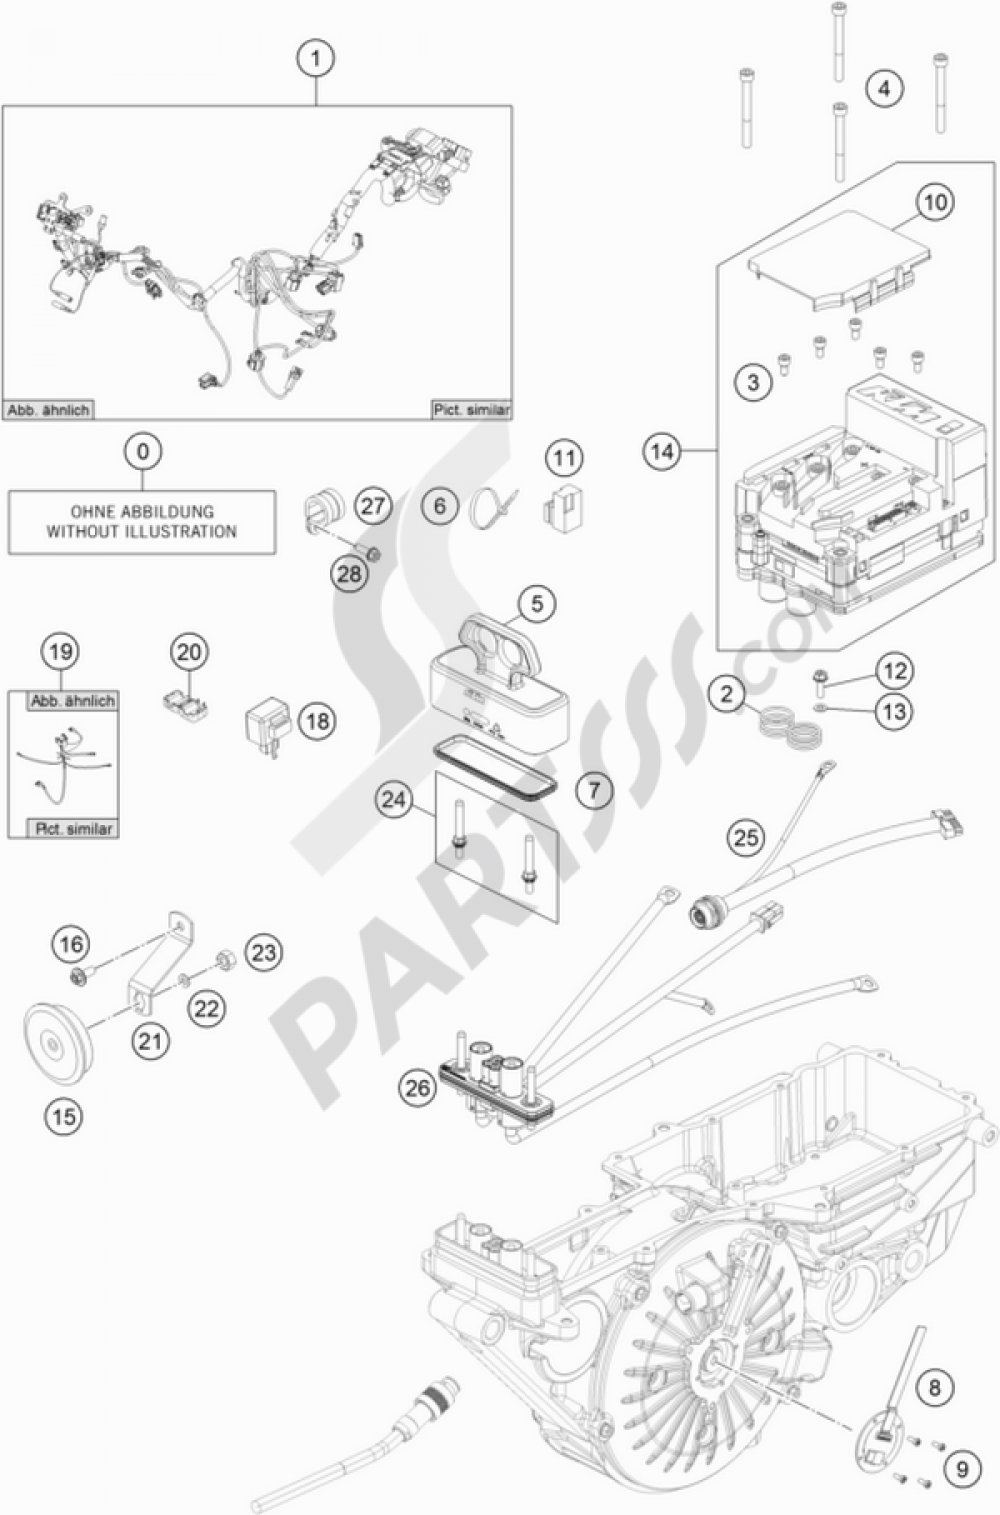 hight resolution of ktm freeride wiring diagram